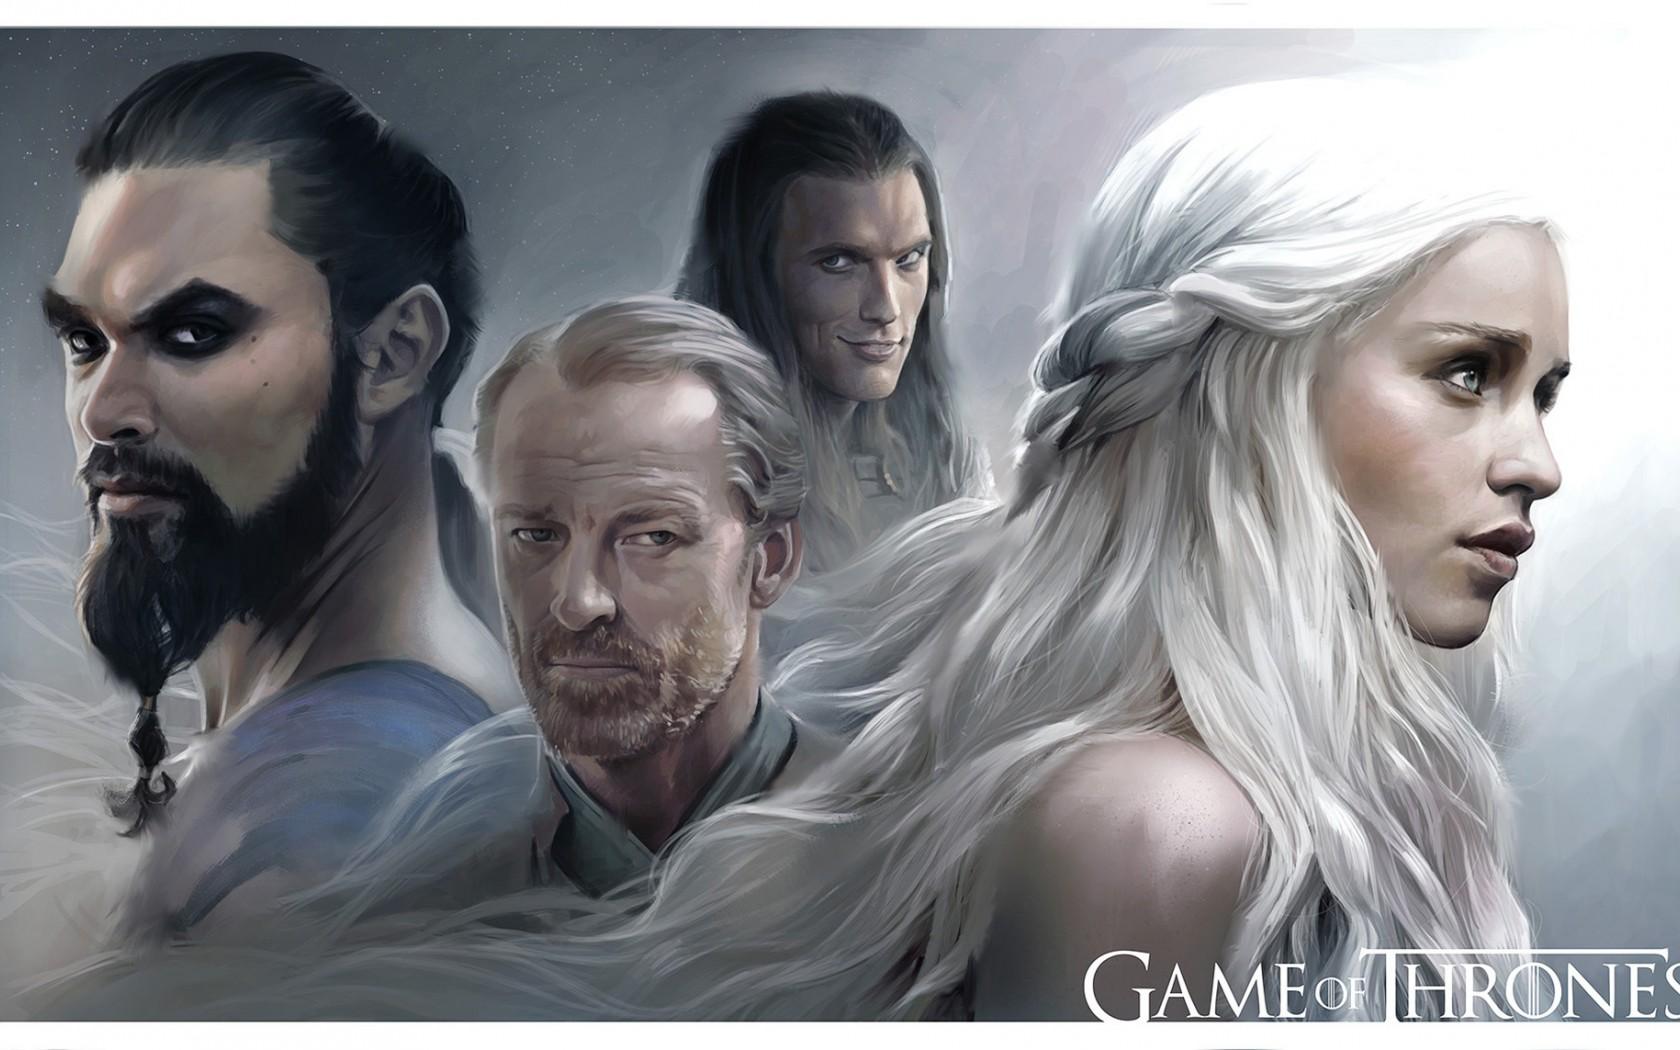 Fondos De Pantalla Game Of Thrones Emilia Clarke